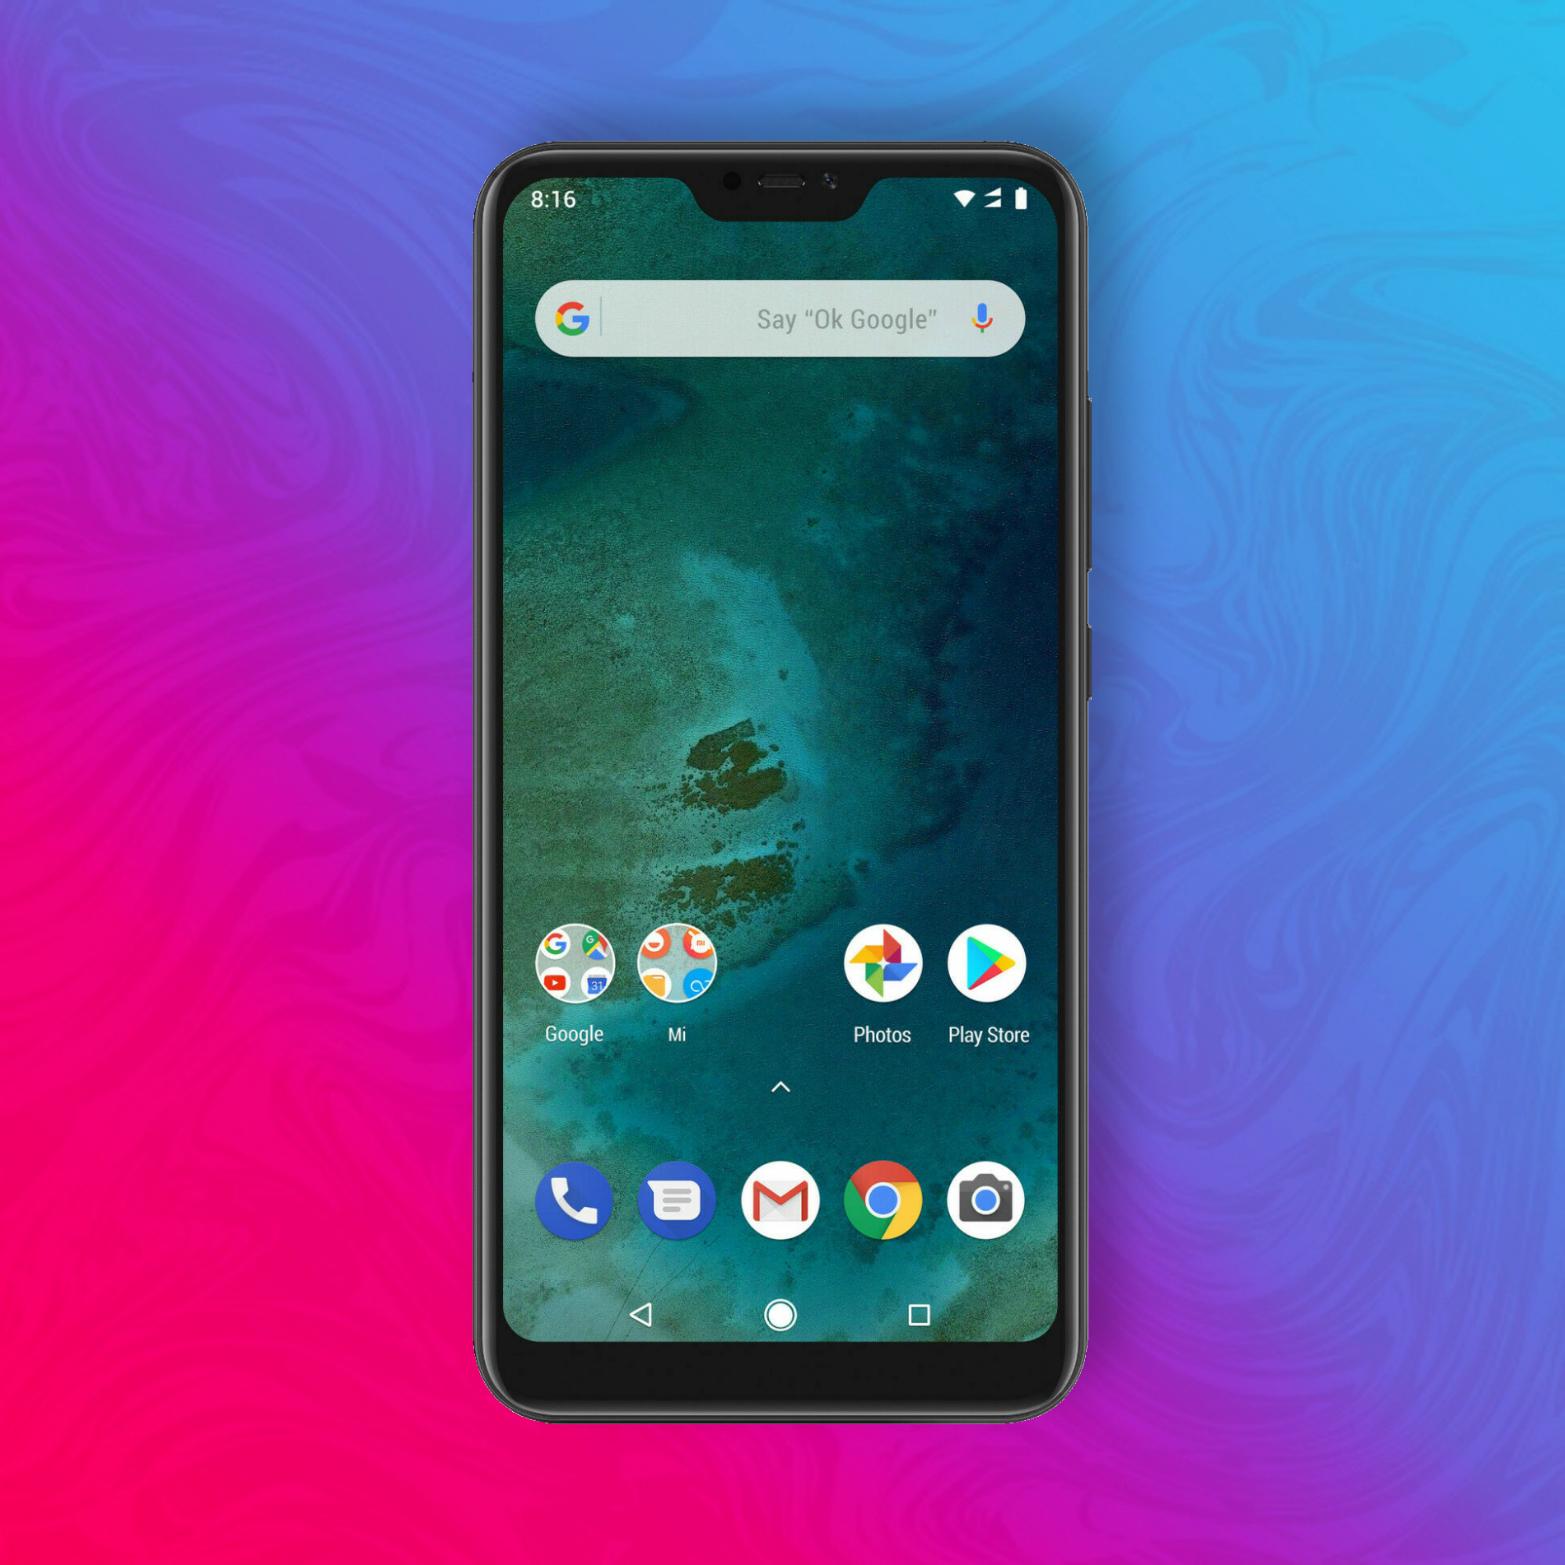 Xiaomi Mi A2 Lite 32/3GB - Snapdragon 625 - 12MP/5MP - 4000mAh Akku - Triple Slot | V&V durch Amazon